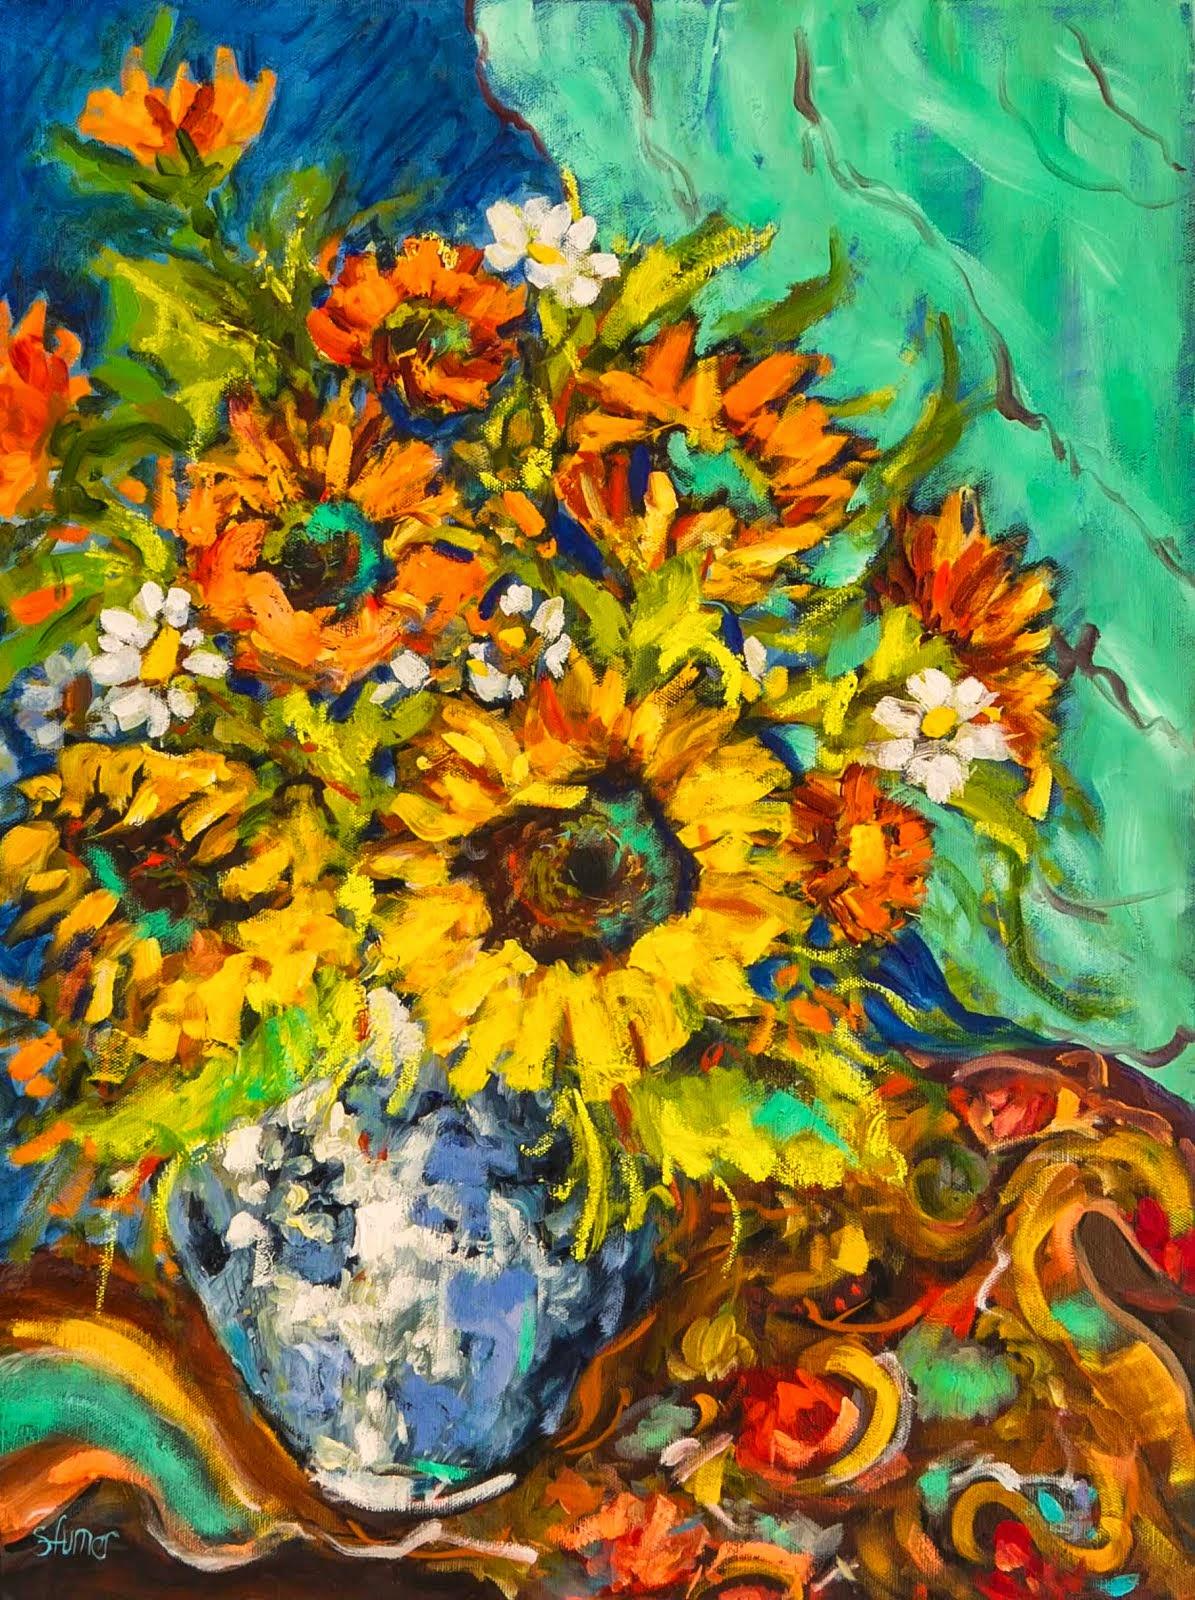 Friday's Sunflowers